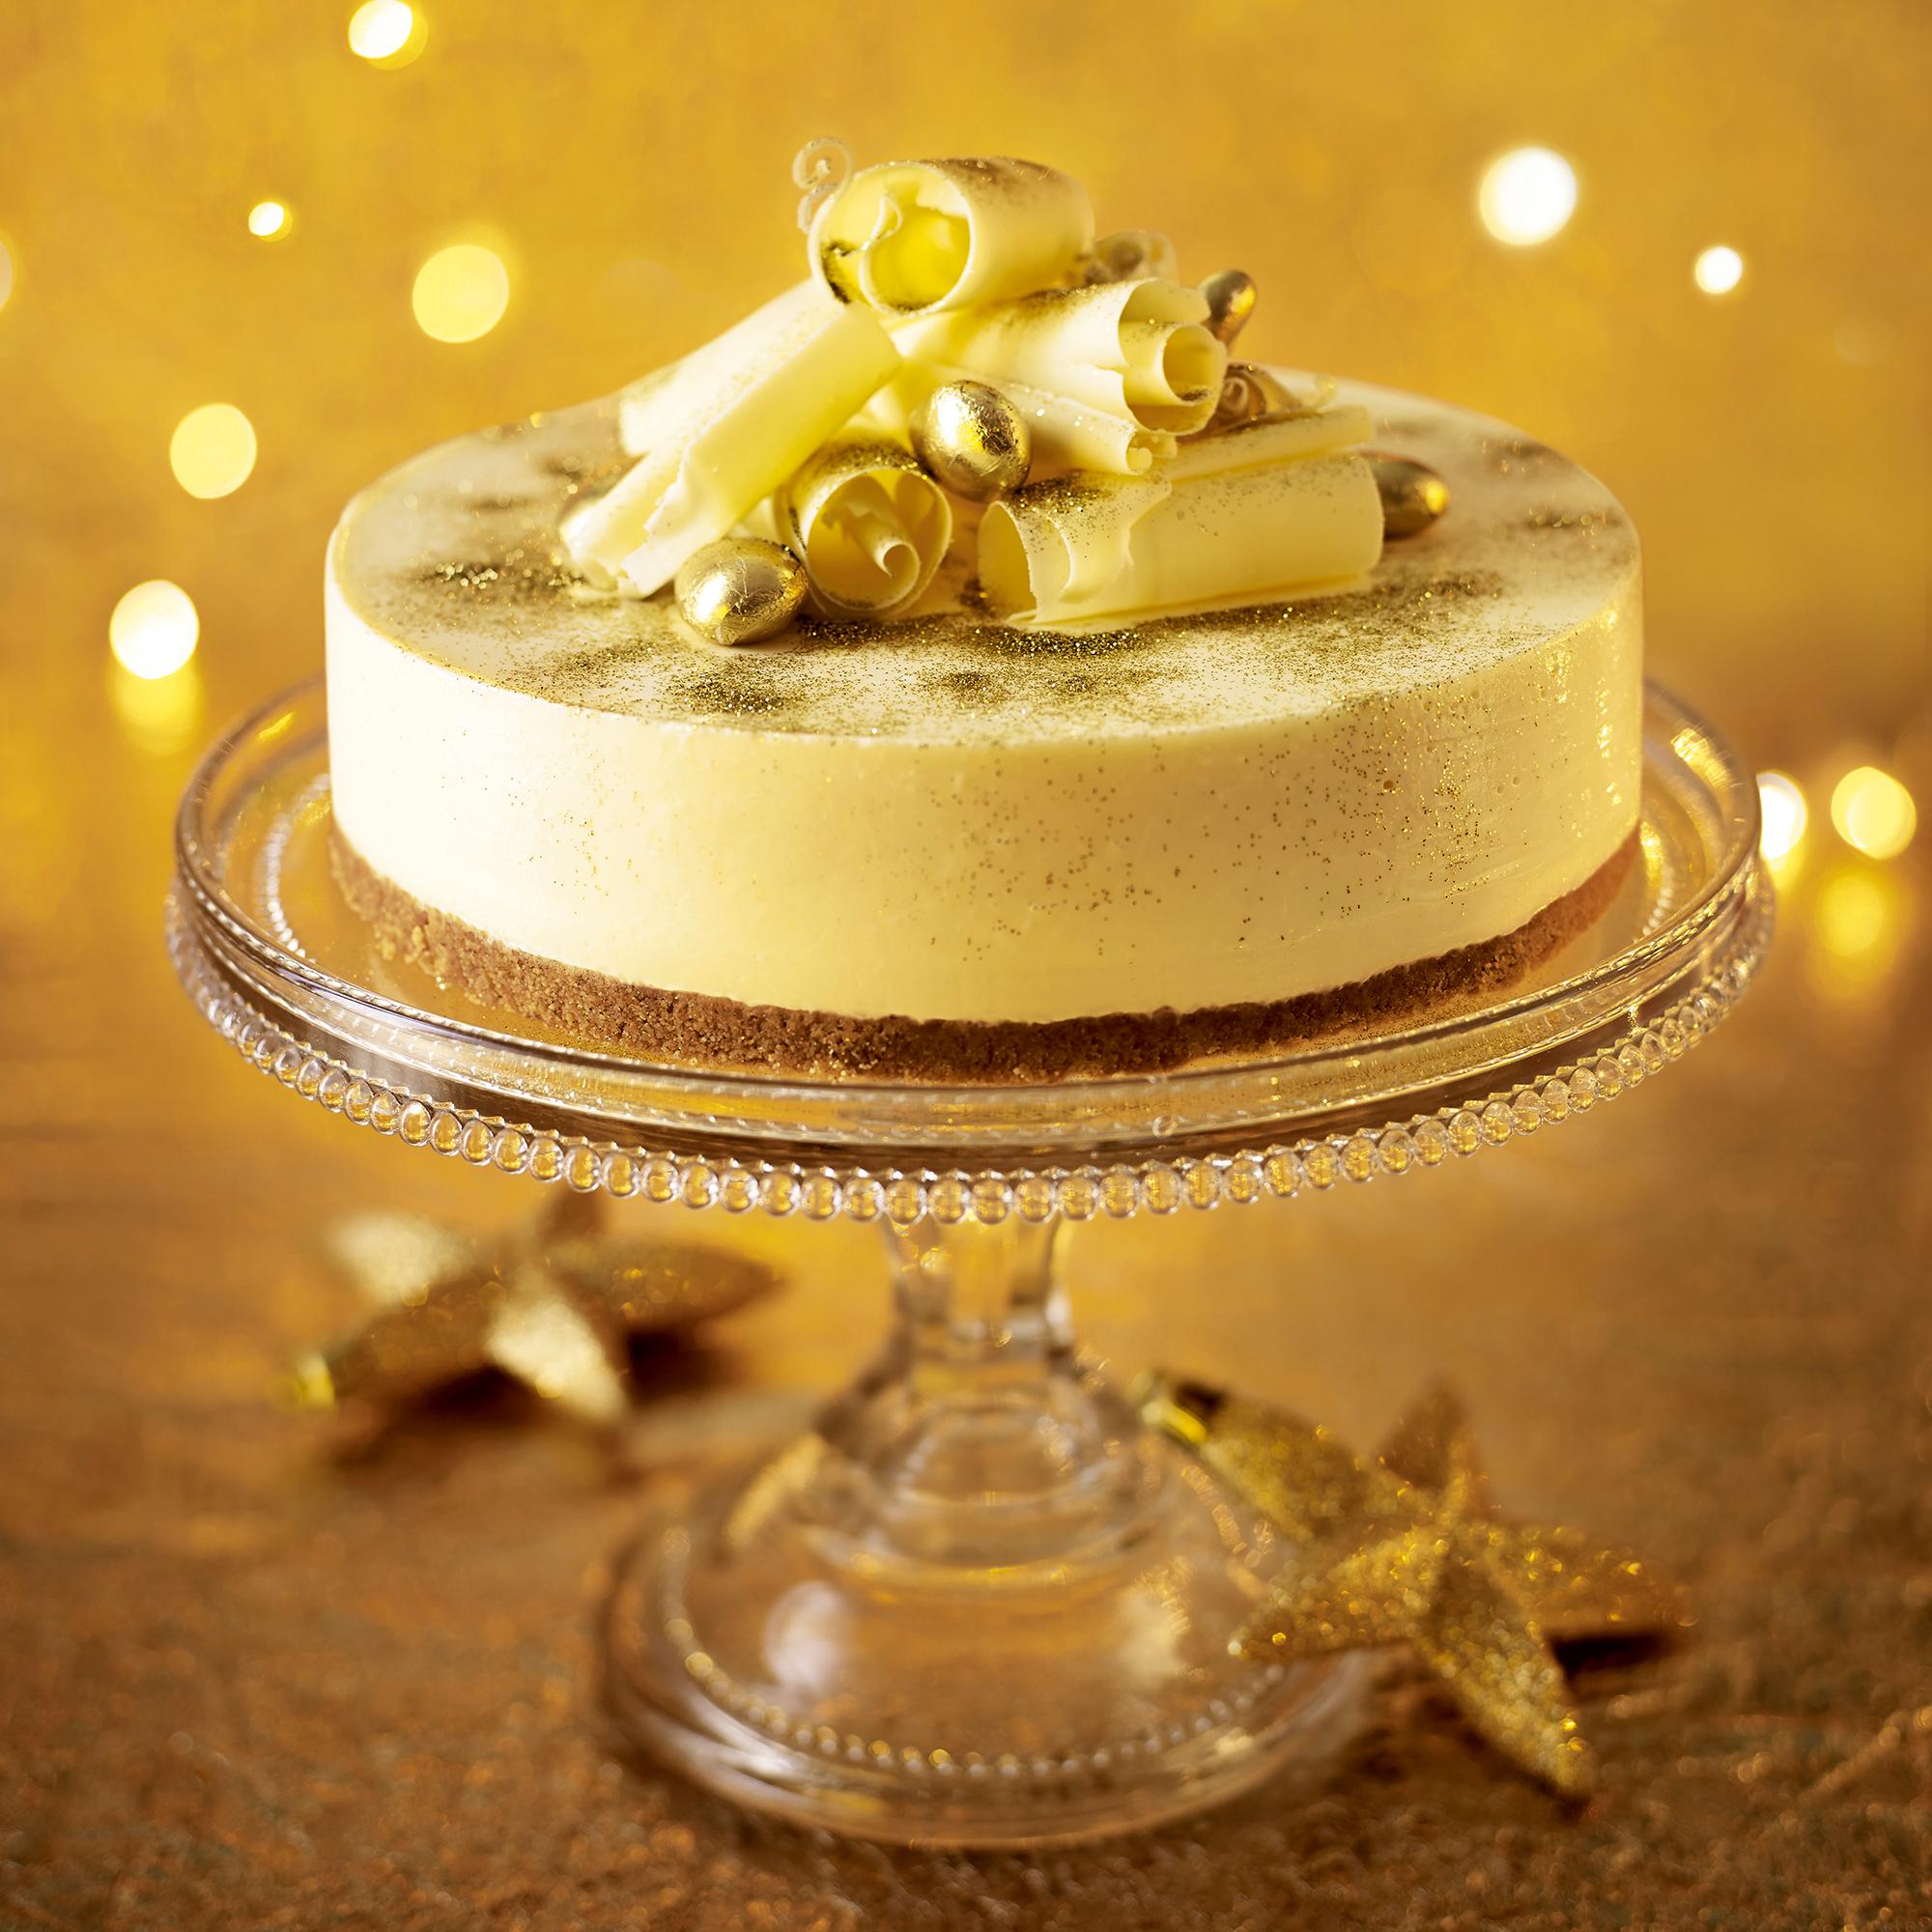 Under Baked Christmas Cake